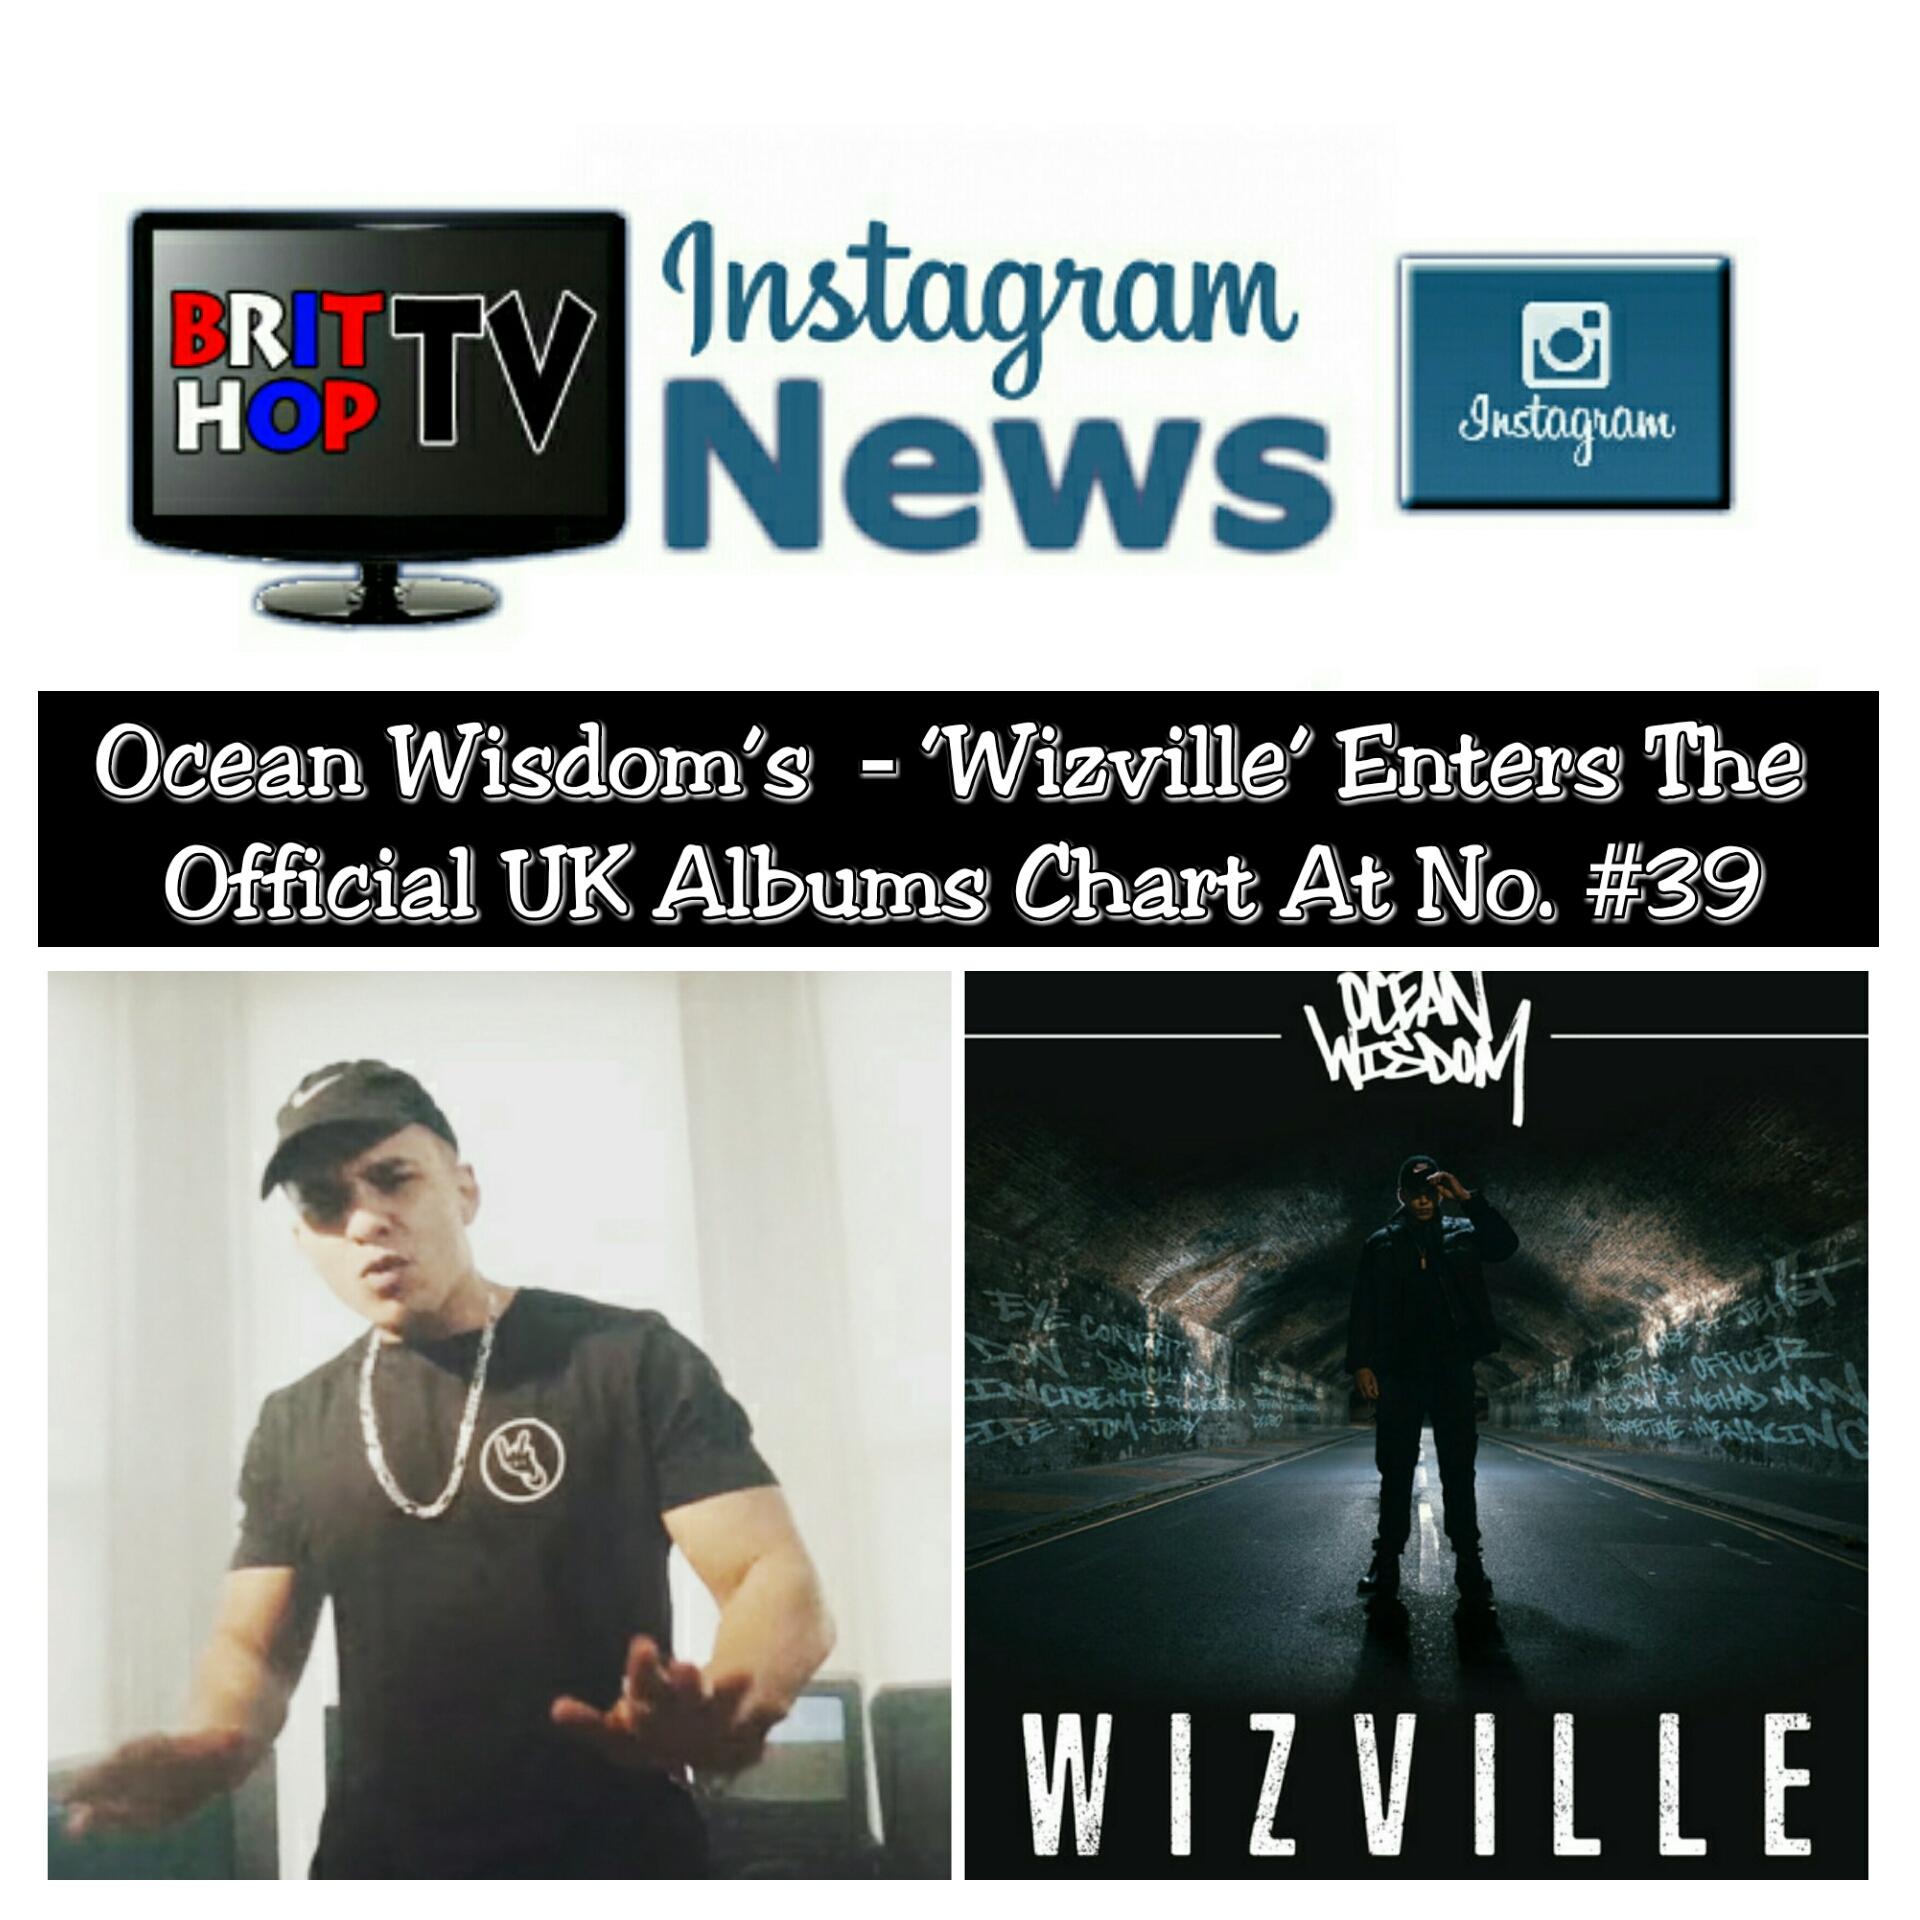 BRITHOPTV: [News] Ocean Wisdom's (@Ocean_Wisdom) – 'Wizville' Enters The Official UK Albums Chart At No. #39 | #UKRap #UKHipHop